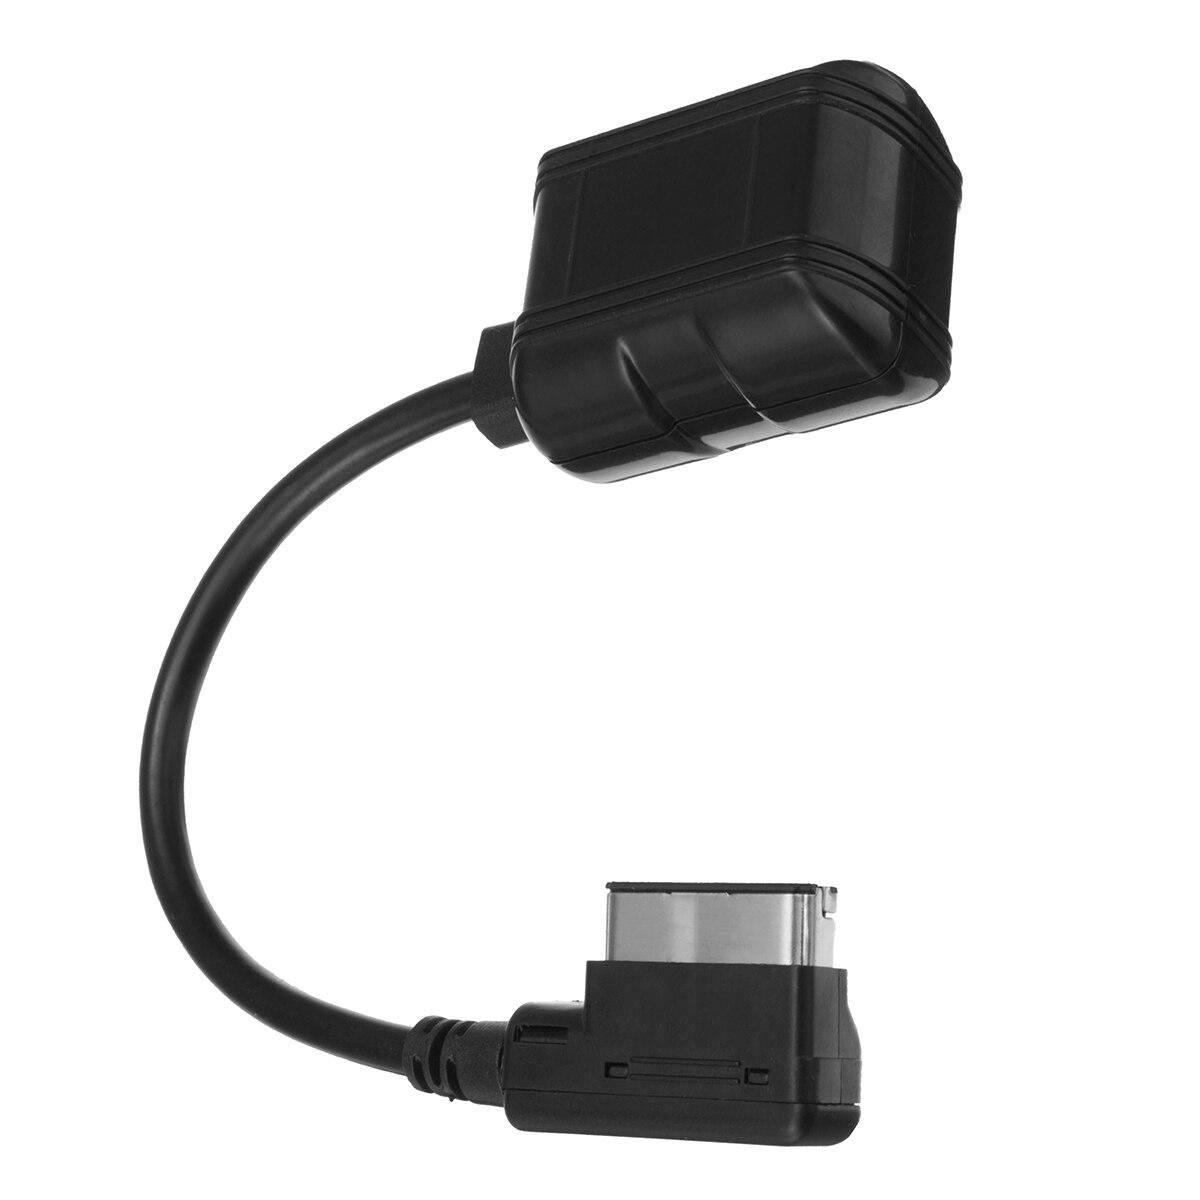 21cm black bluetooth music audio interface adapter data. Black Bedroom Furniture Sets. Home Design Ideas